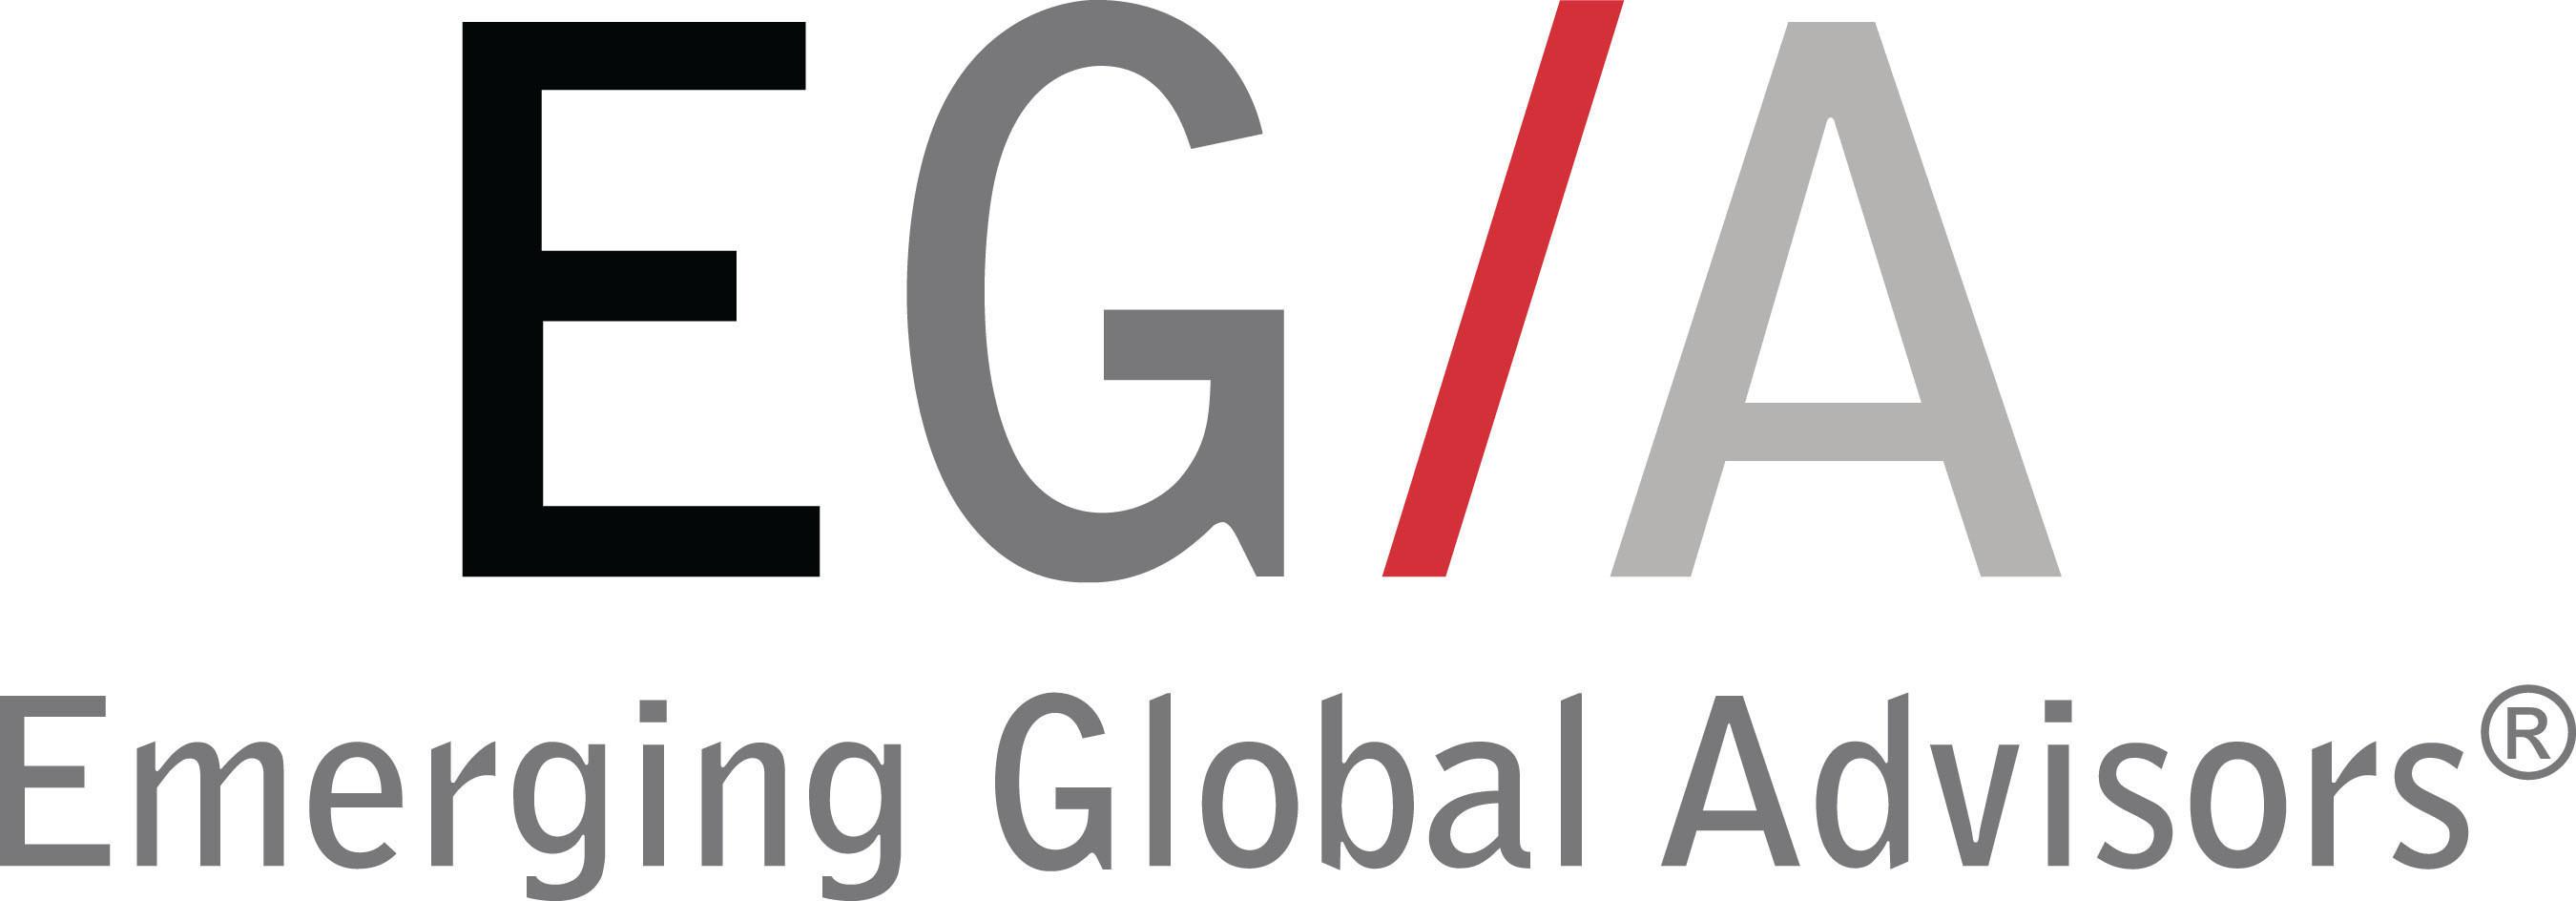 Emerging Global Advisors (EGA) is a leading provider of strategic beta portfolios in emerging markets and we ...